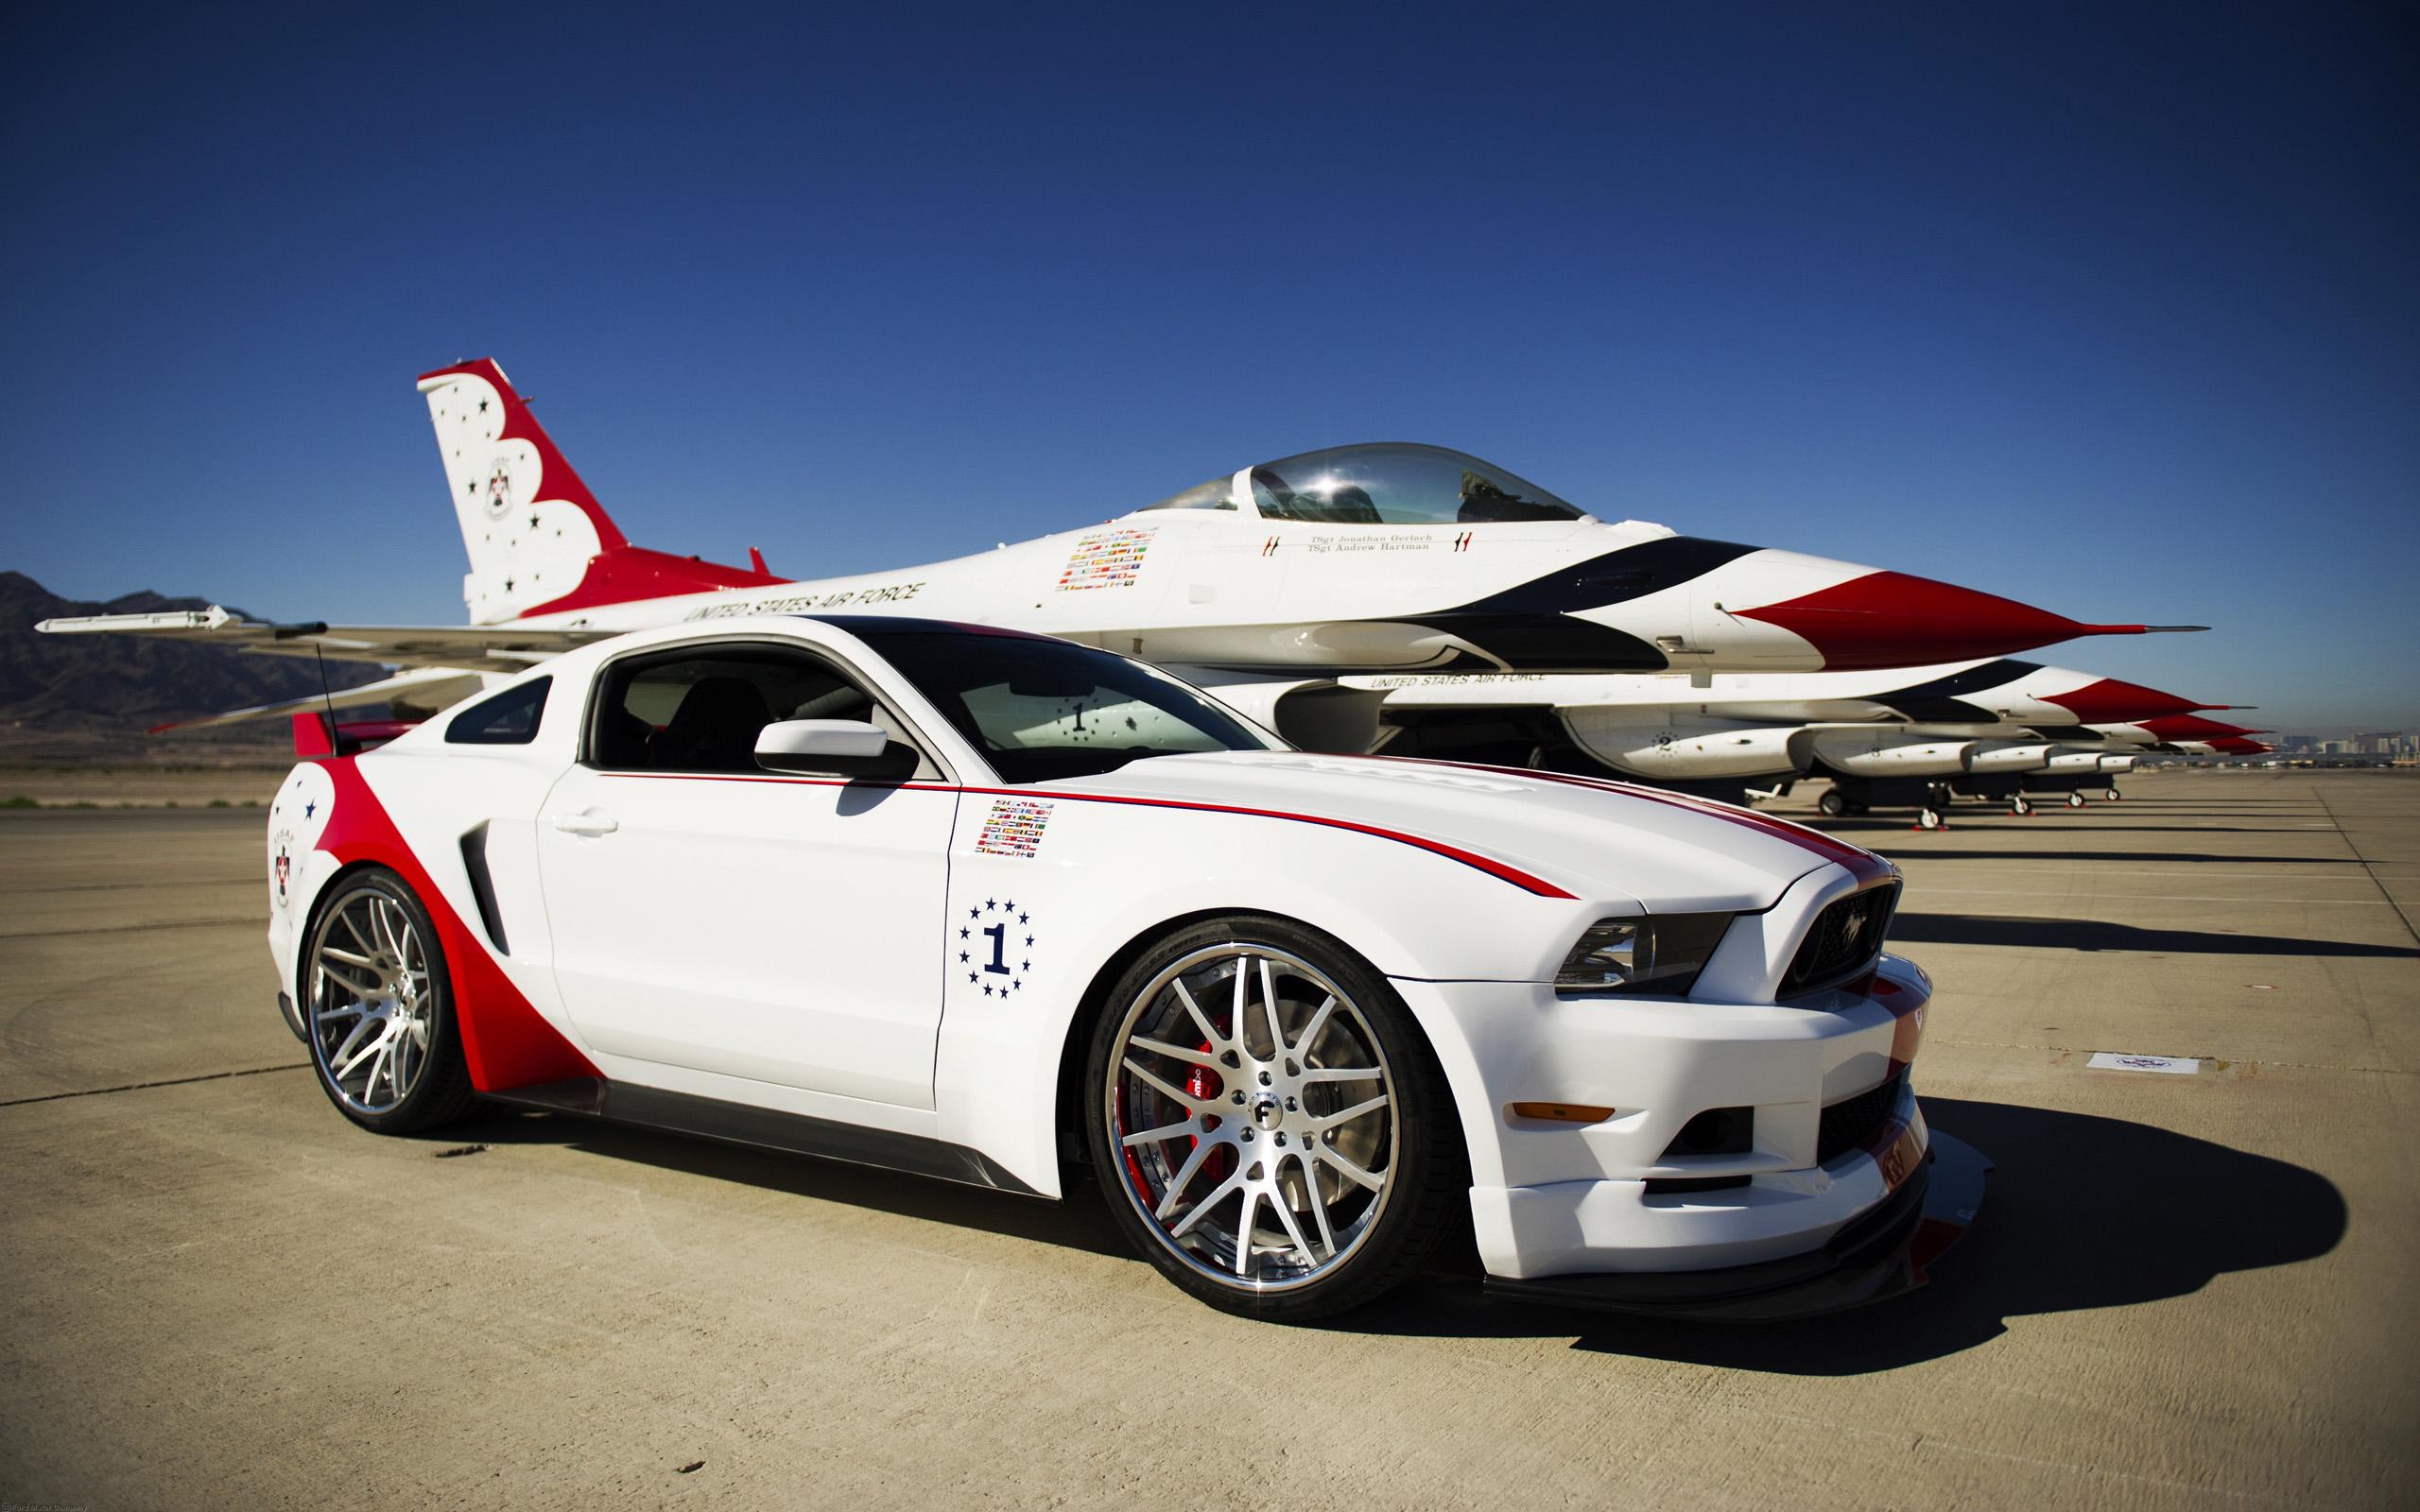 GT US Air Force Thunderbirds Edition Wallpaper HD Car Wallpapers 2560x1600